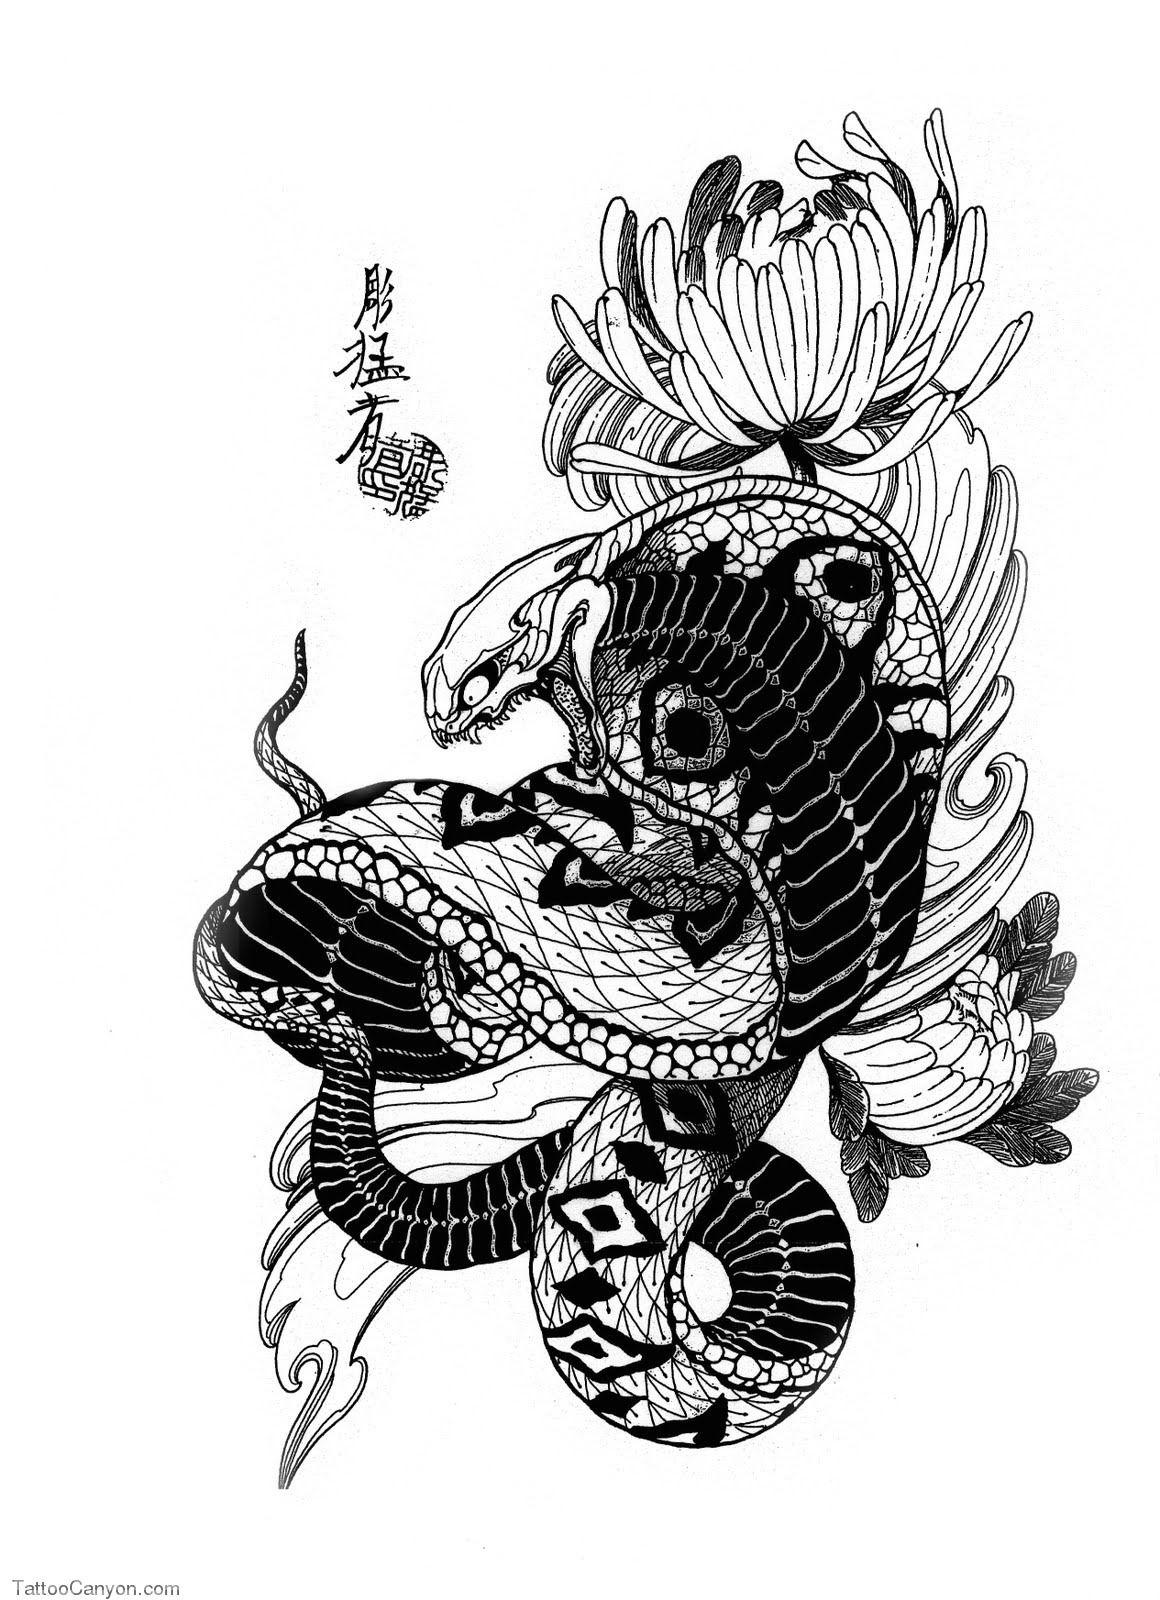 100 japanese tattoo designs i by jack mosher aka horimouja 100 japanese tattoo designs i by jack mosher aka horimouja google search biocorpaavc Choice Image